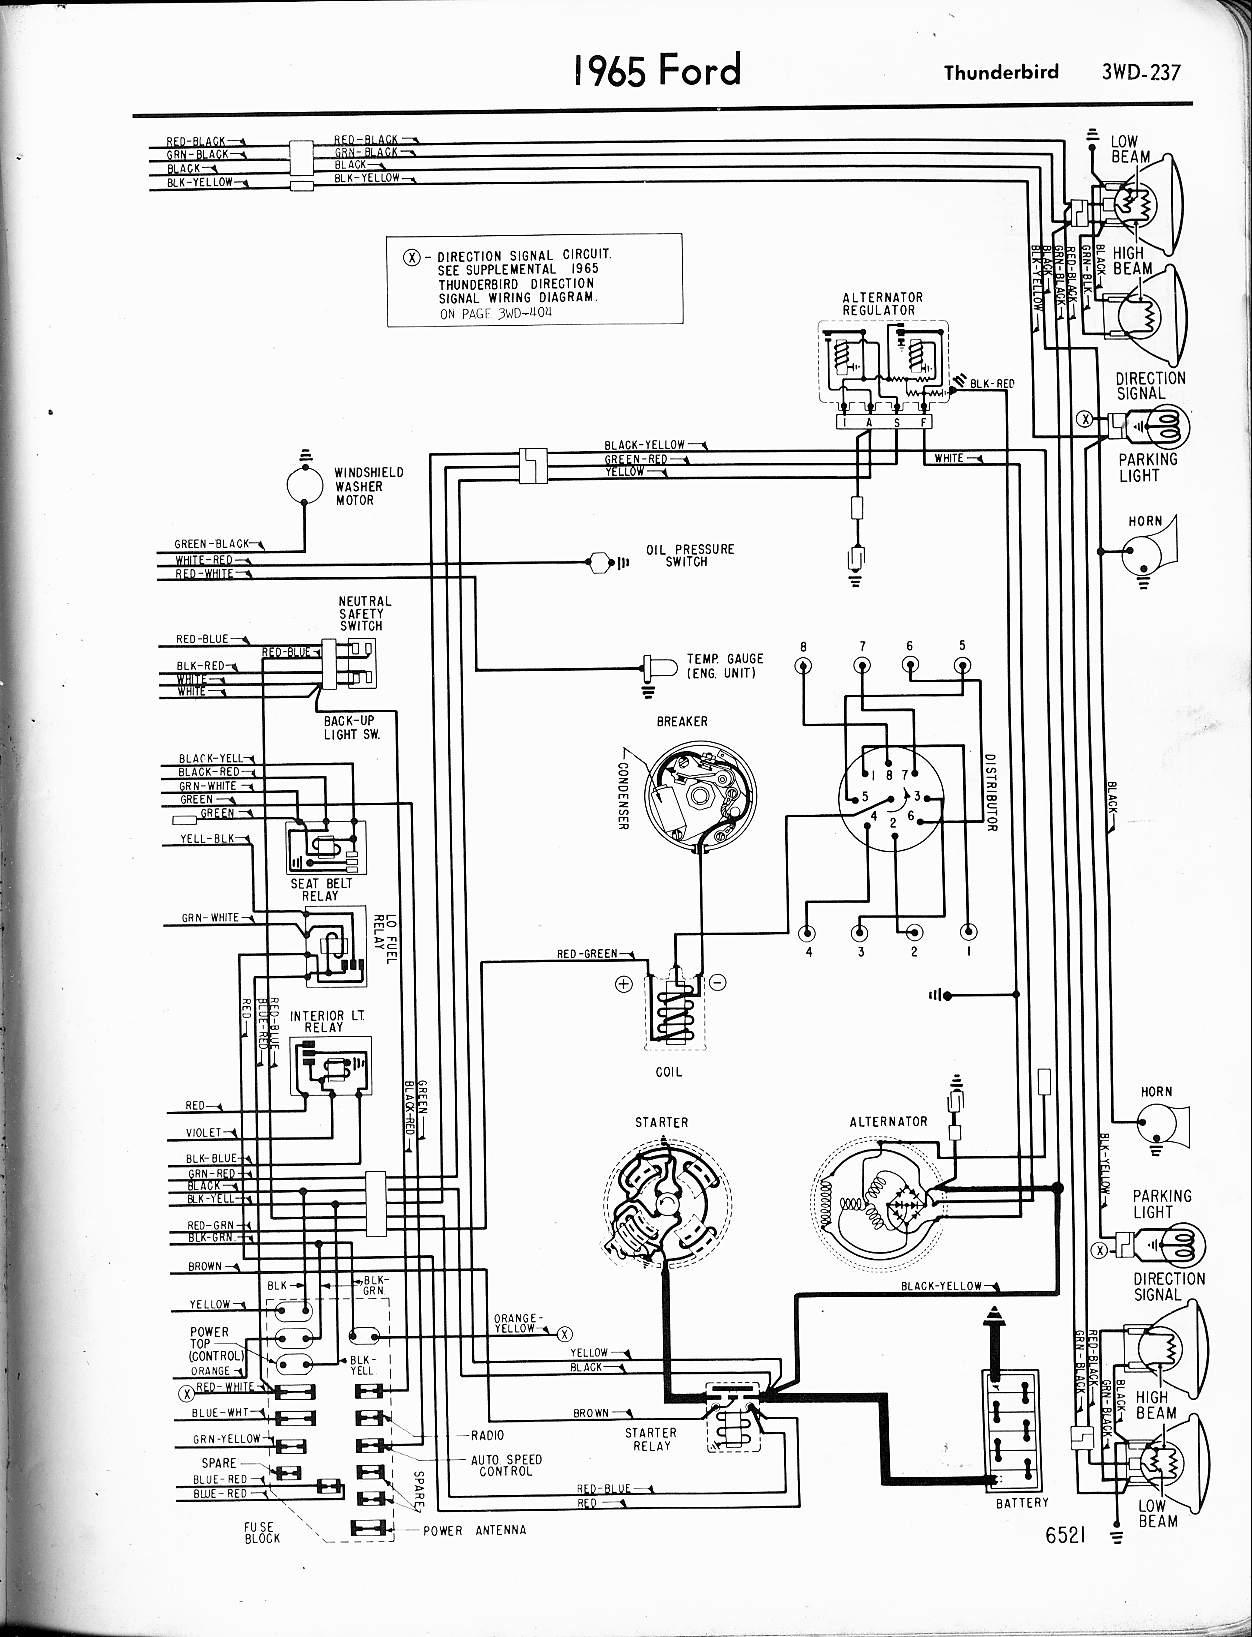 1965 ford thunderbird alternator wiring diagram image details rh motogurumag com 1965 ford galaxie 500 alternator wiring diagram 1965 ford galaxie 500 alternator wiring diagram